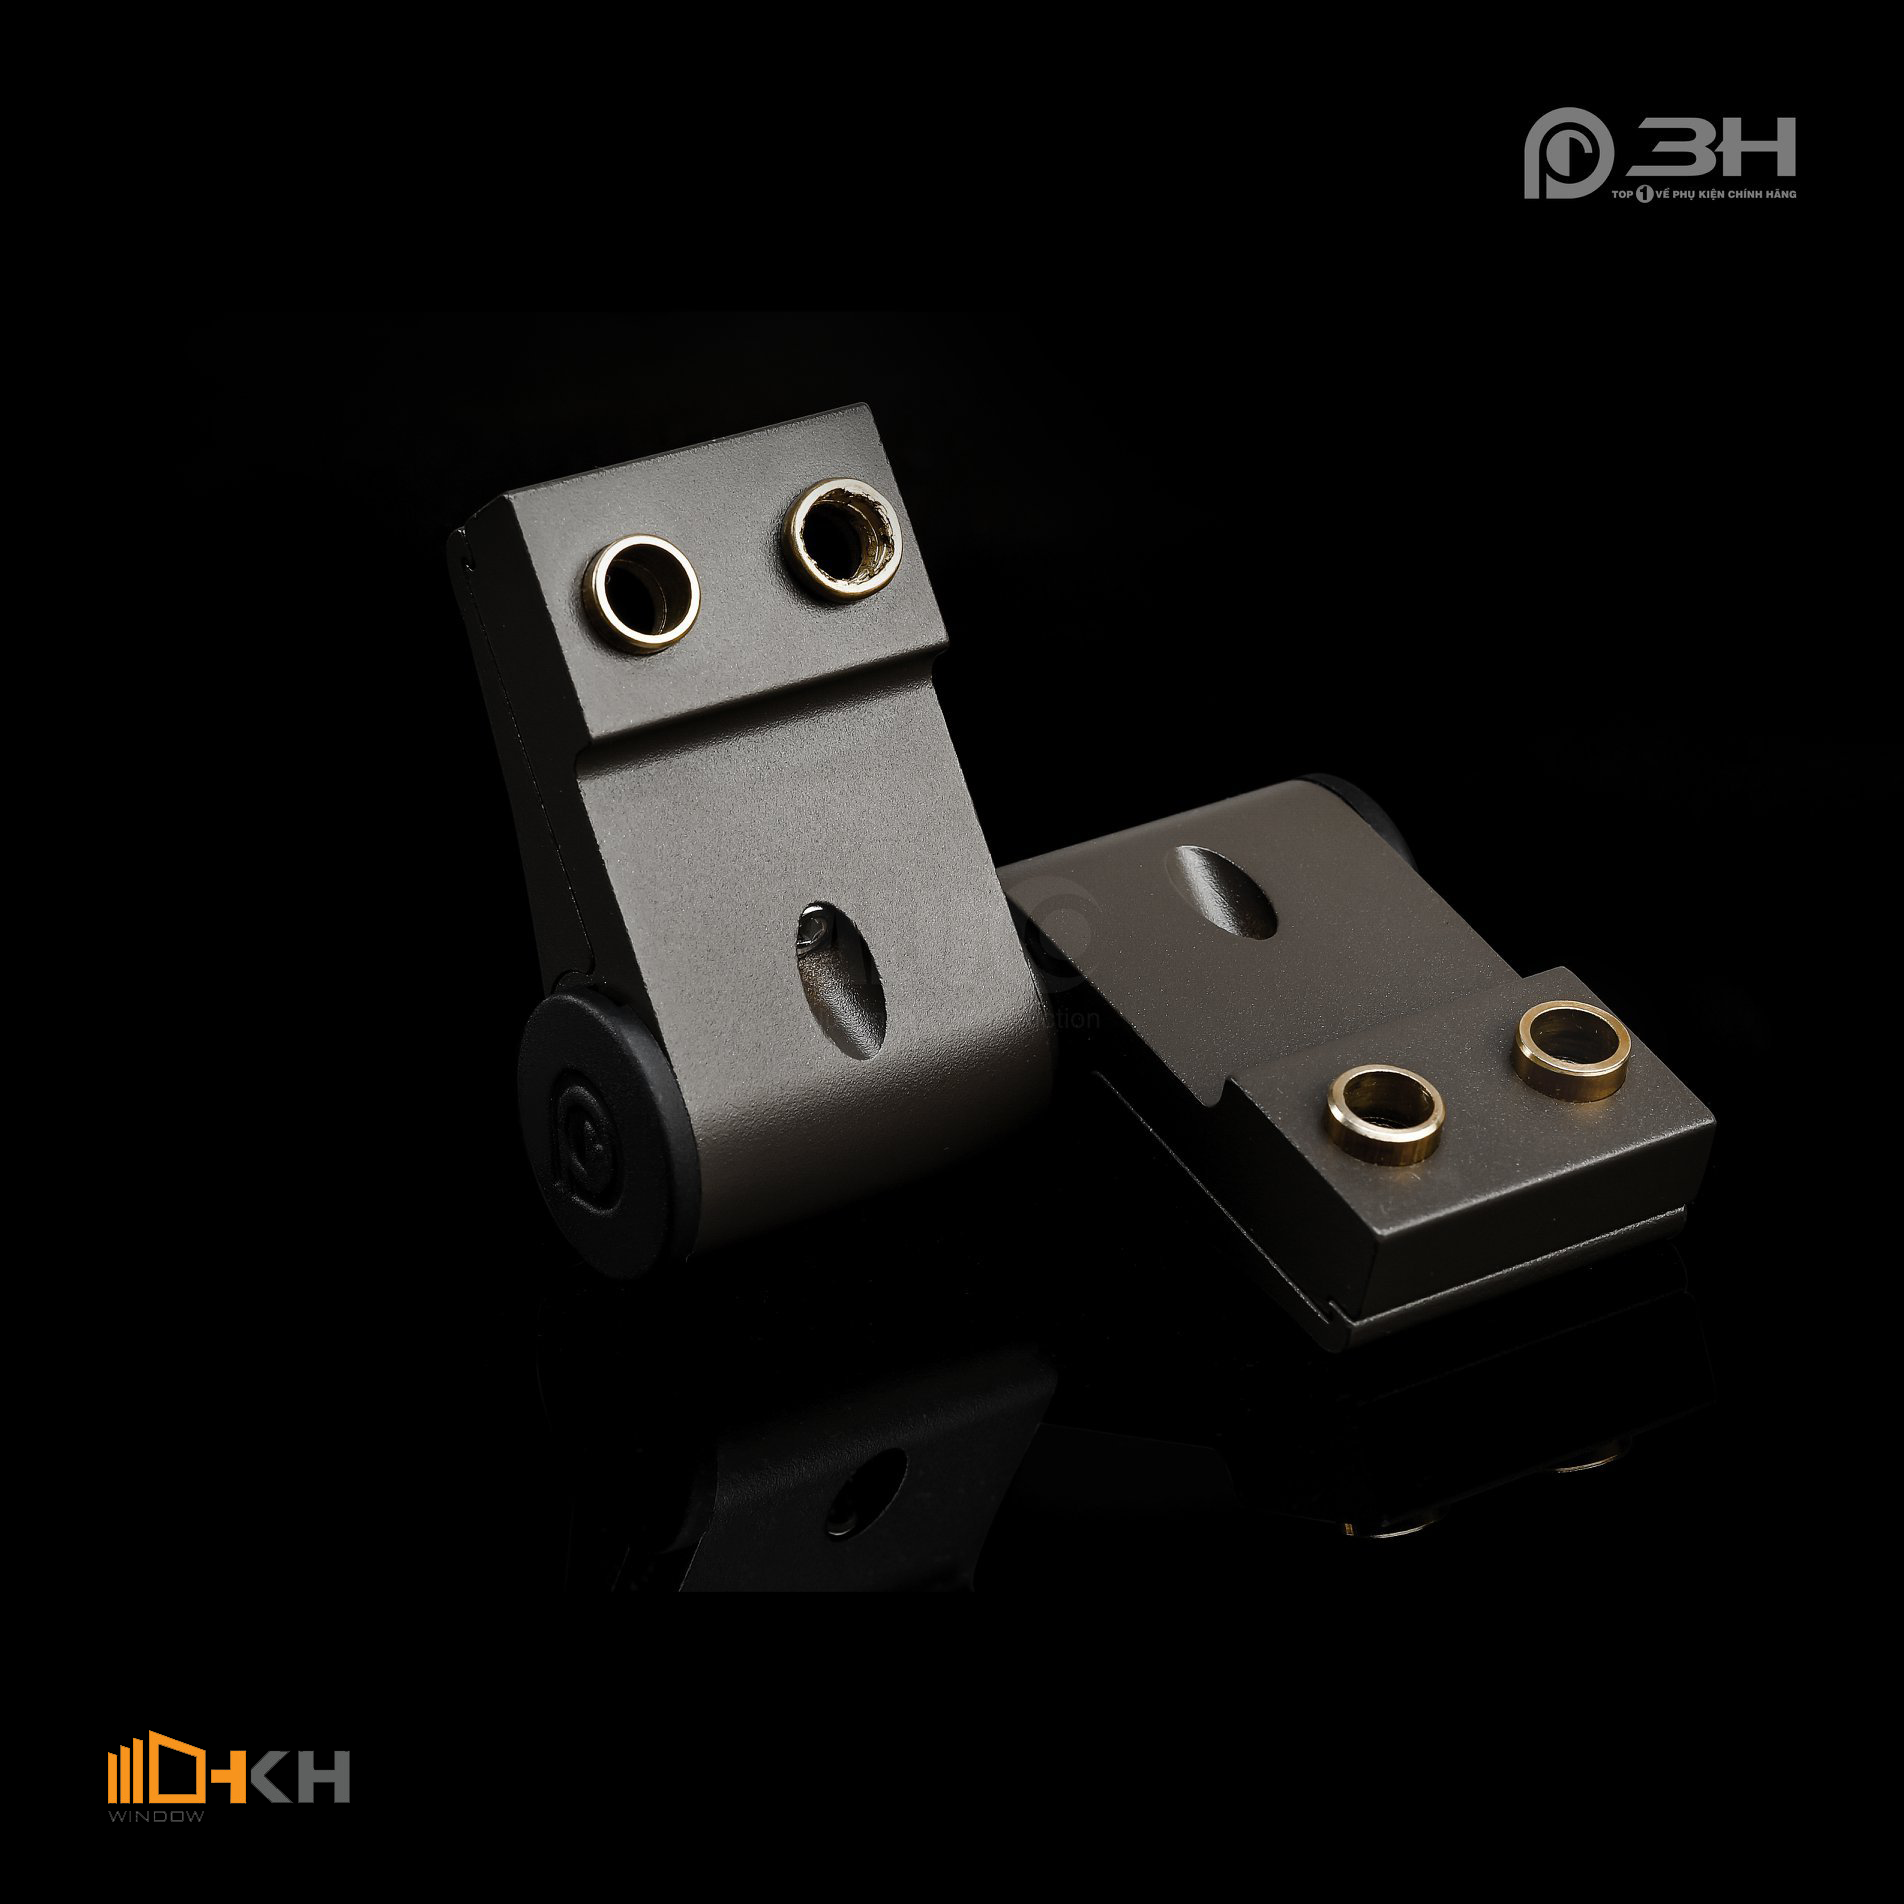 Lề 93 phụ kiện 3H hehexin - HKH Window